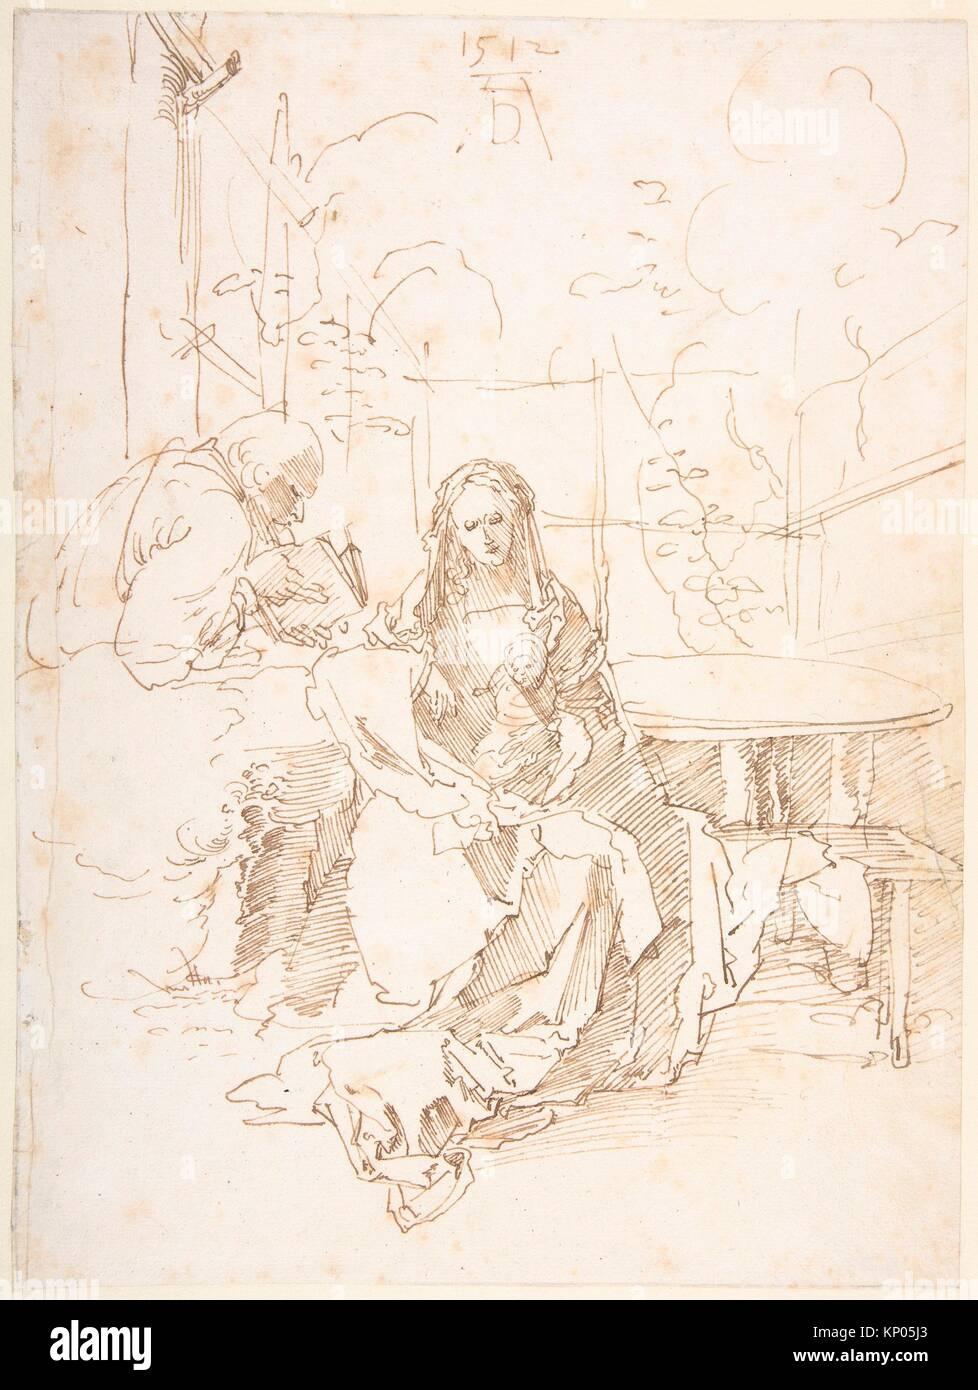 The Holy Family in an Enclosed Garden. Artist: Albrecht Dürer (German, Nuremberg 1471-1528 Nuremberg); Date: - Stock Image